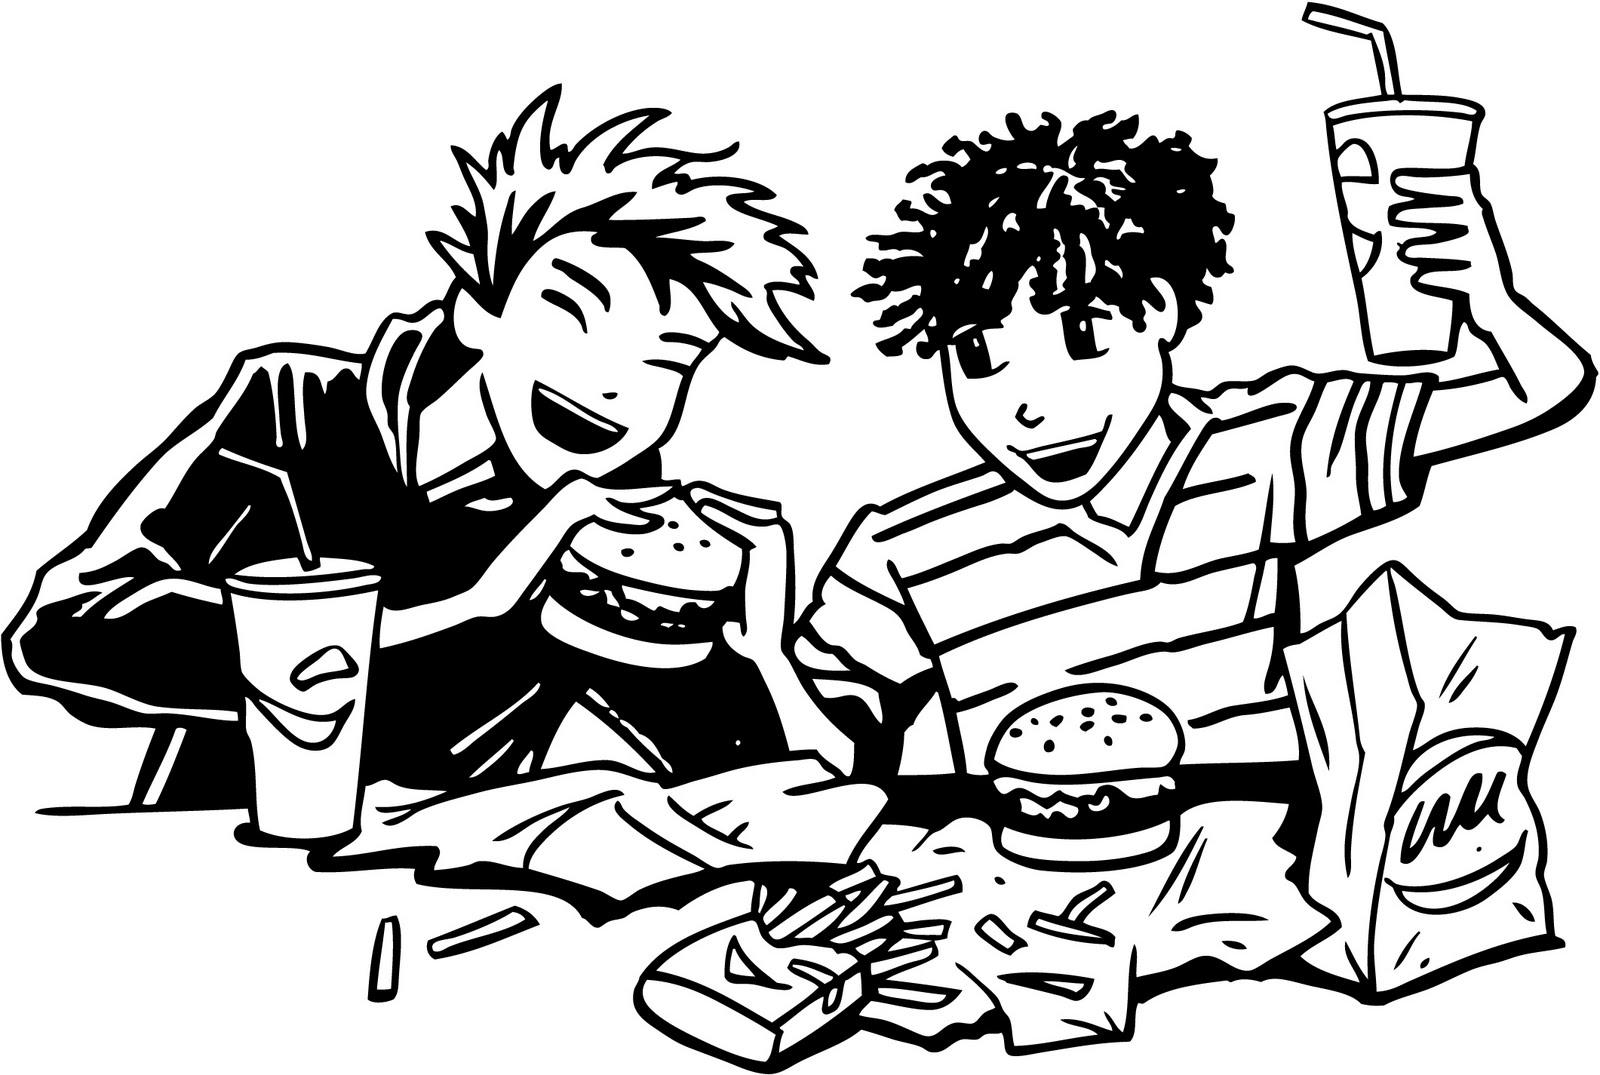 eat hamburgerfries BBW, Black, Blowjob, Huge ass,